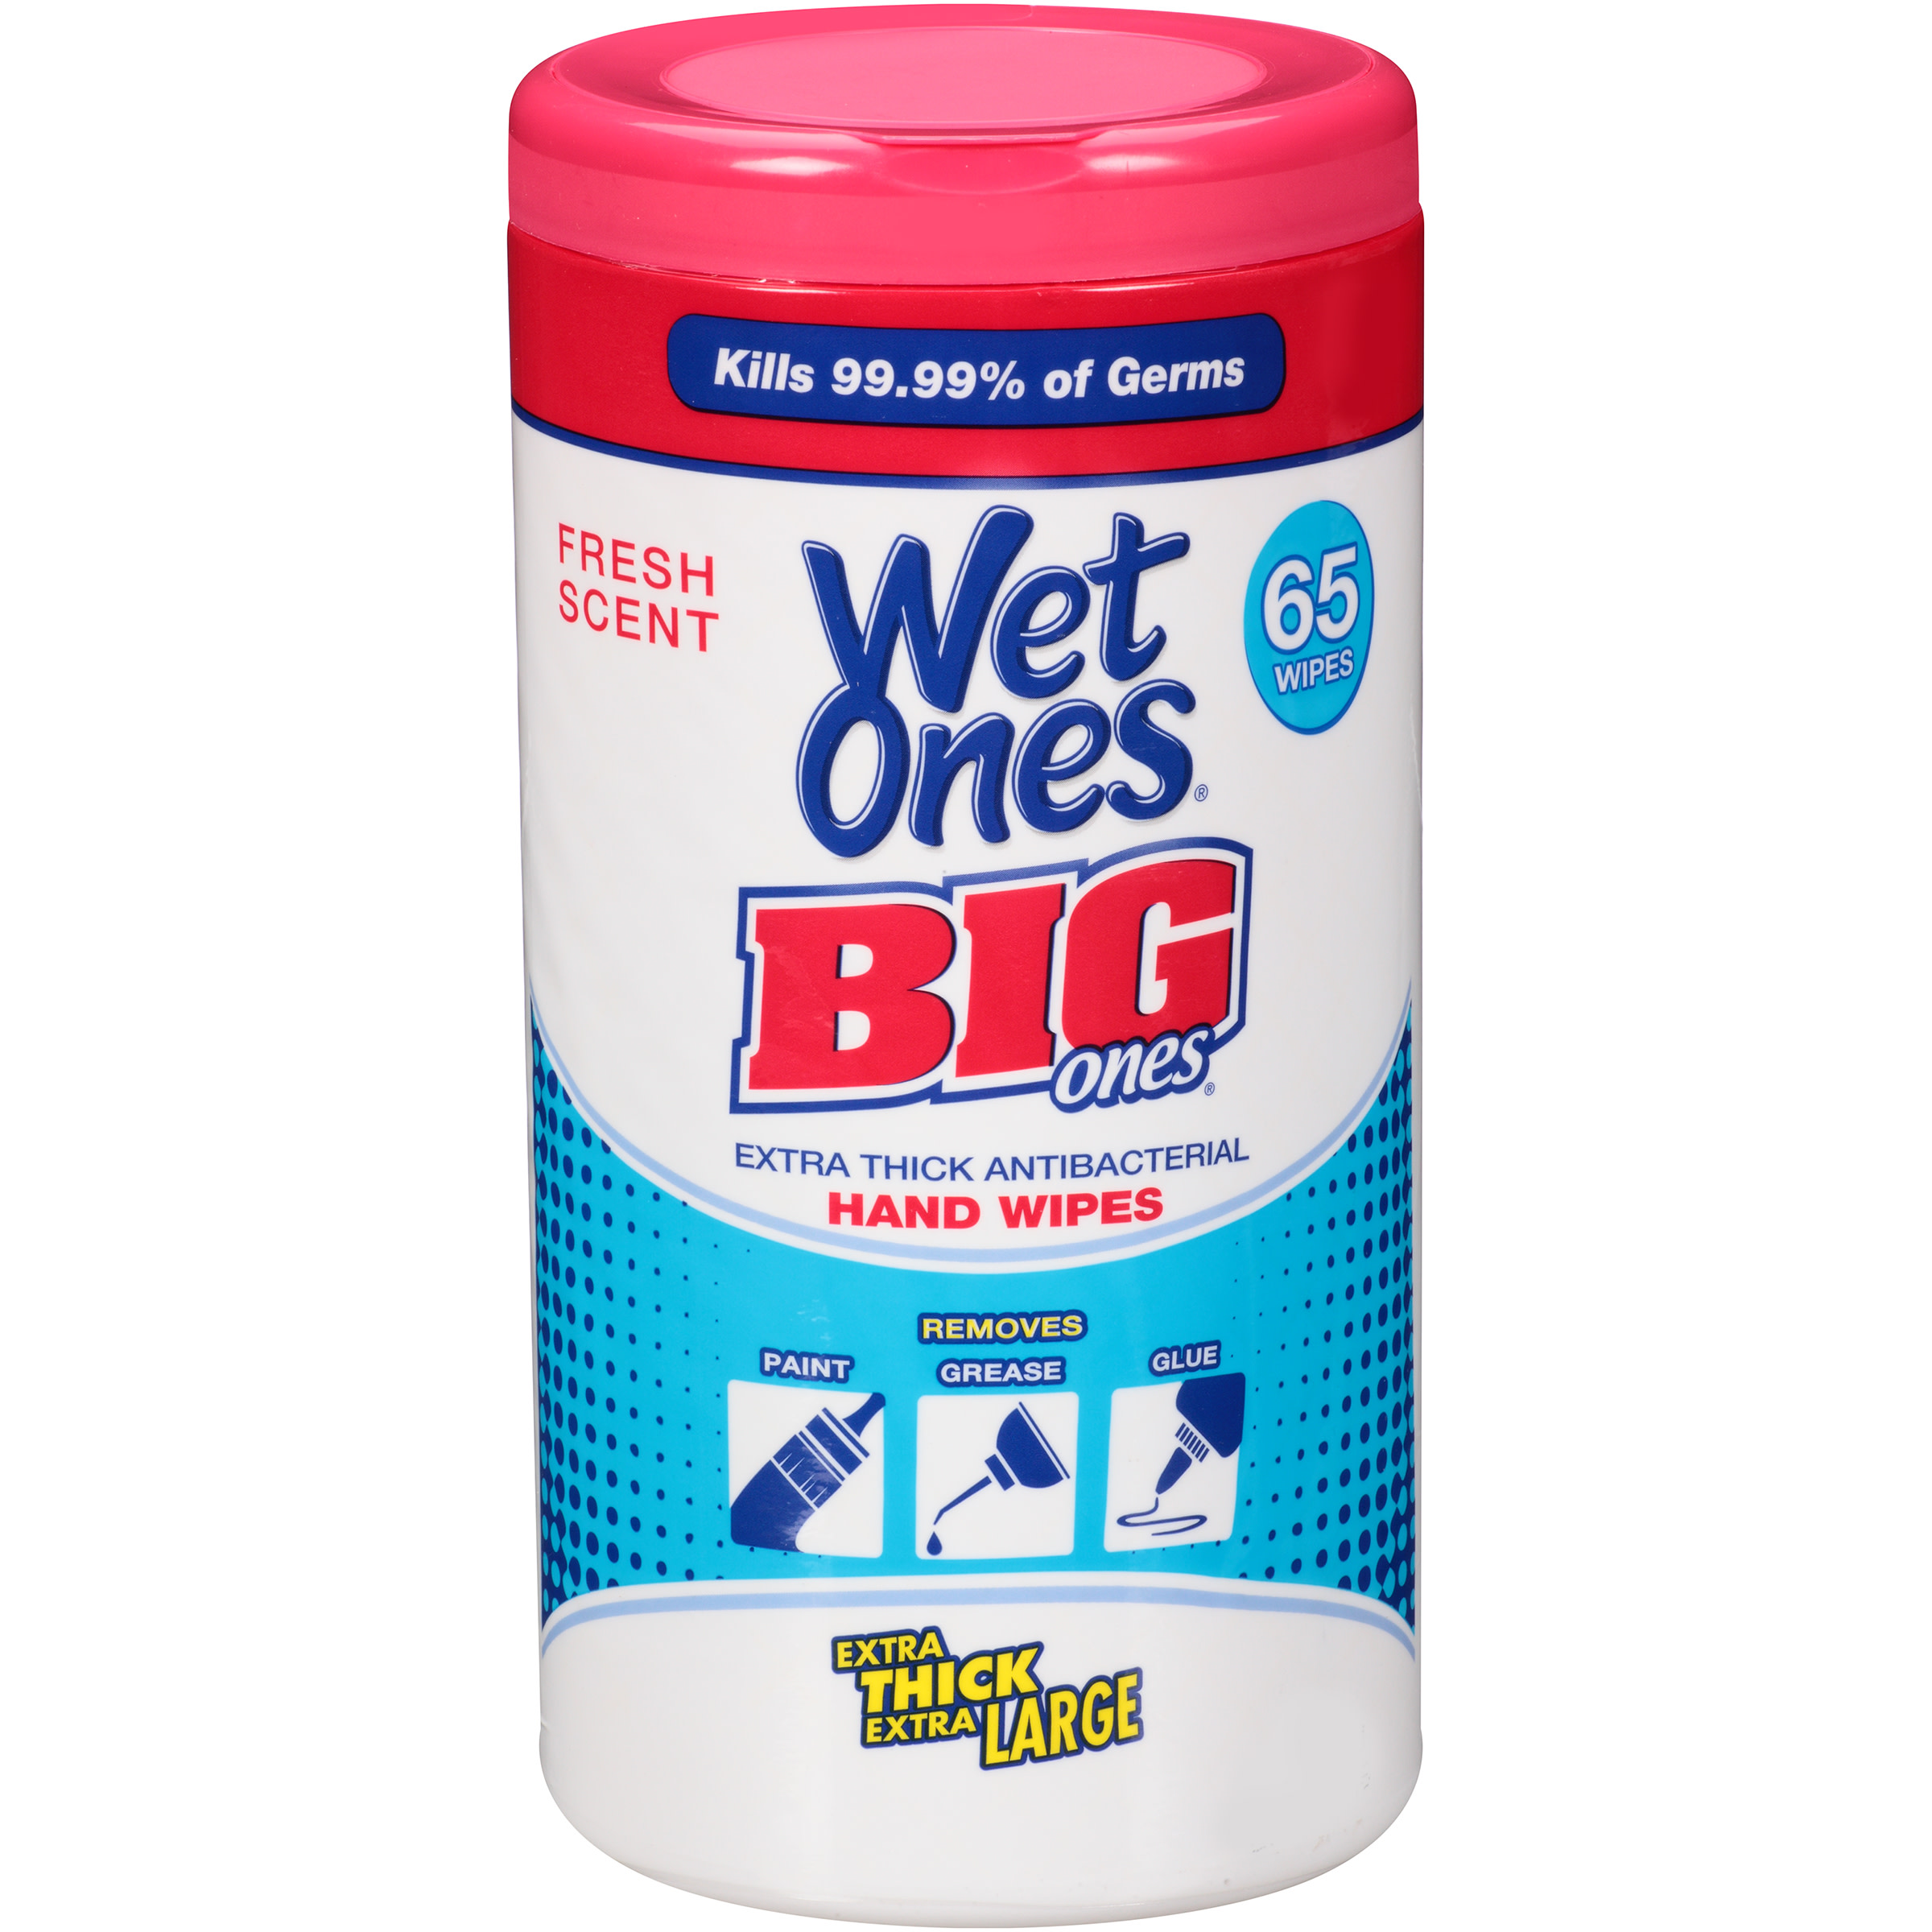 Wet Ones Big Ones Antibacterial Hand Wipes Canister - 65 Count